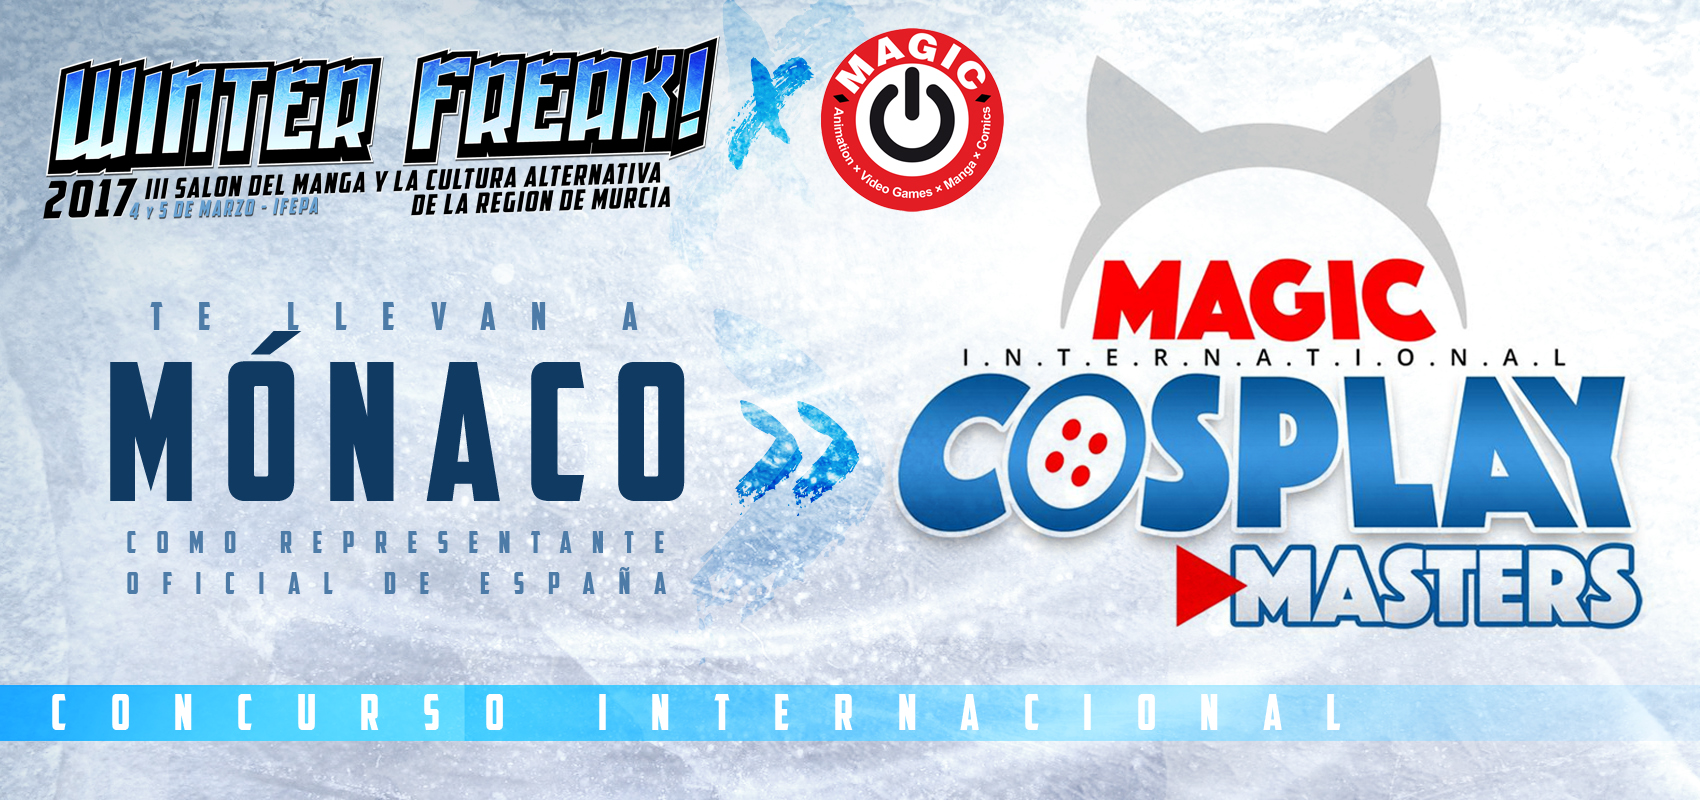 Magic International Cosplay Masters